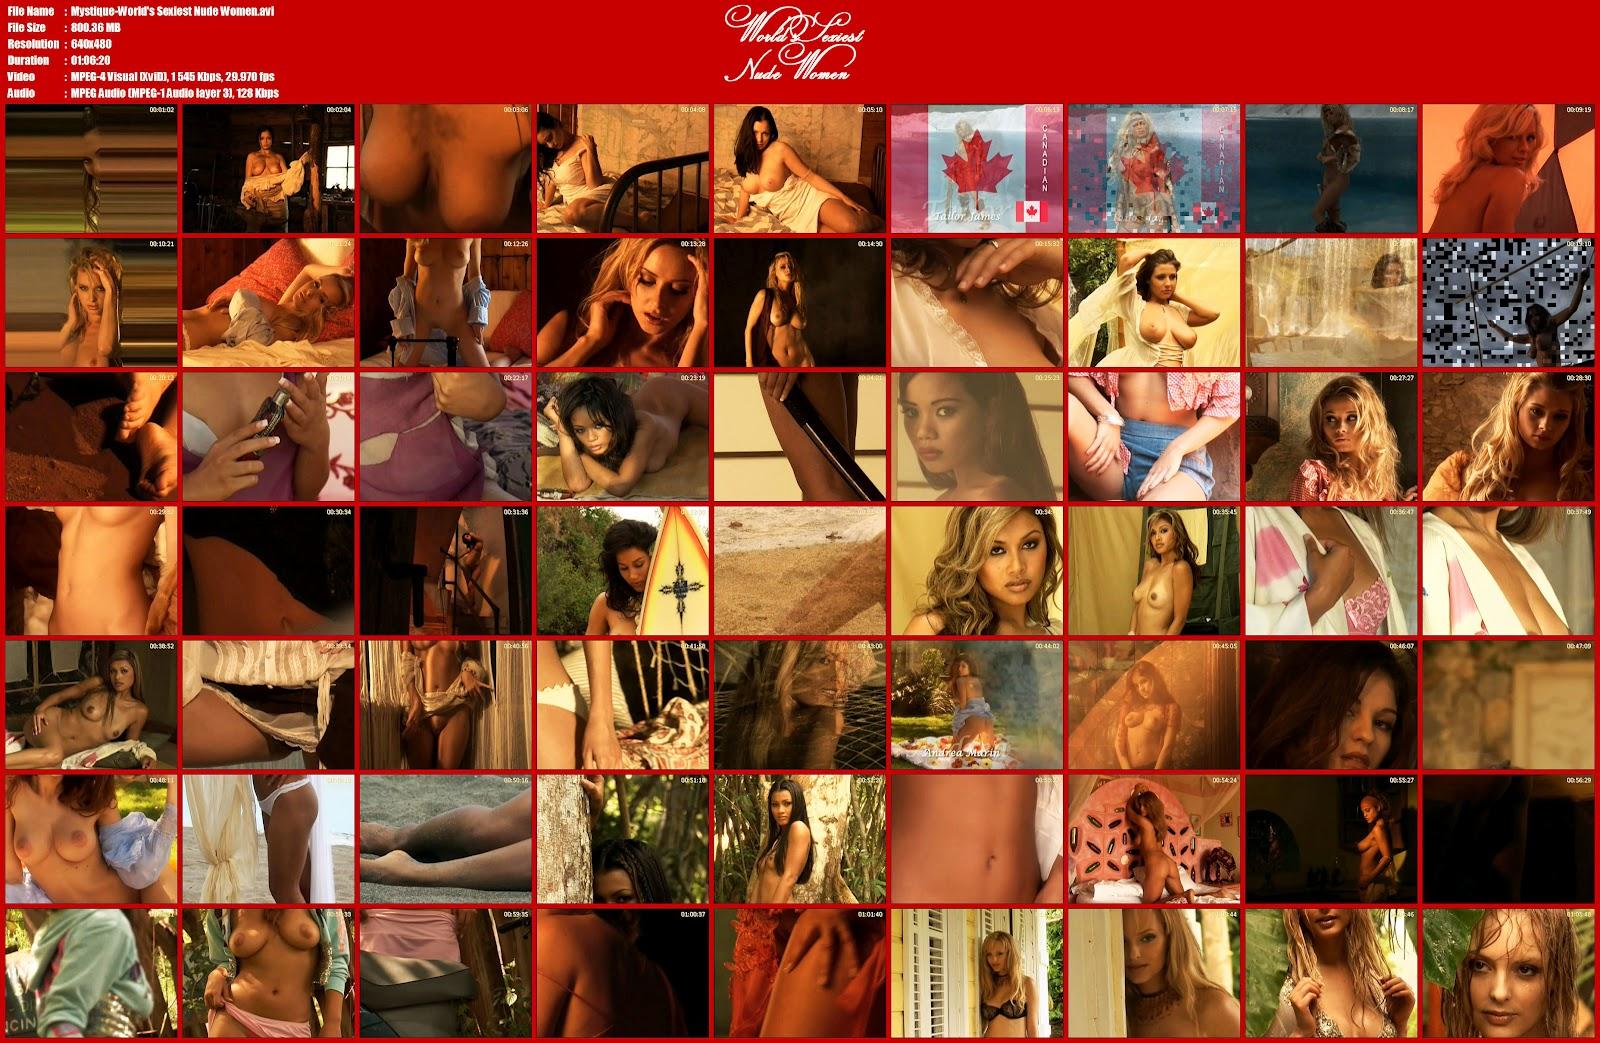 World S Sexiest Nude Women Movie 3